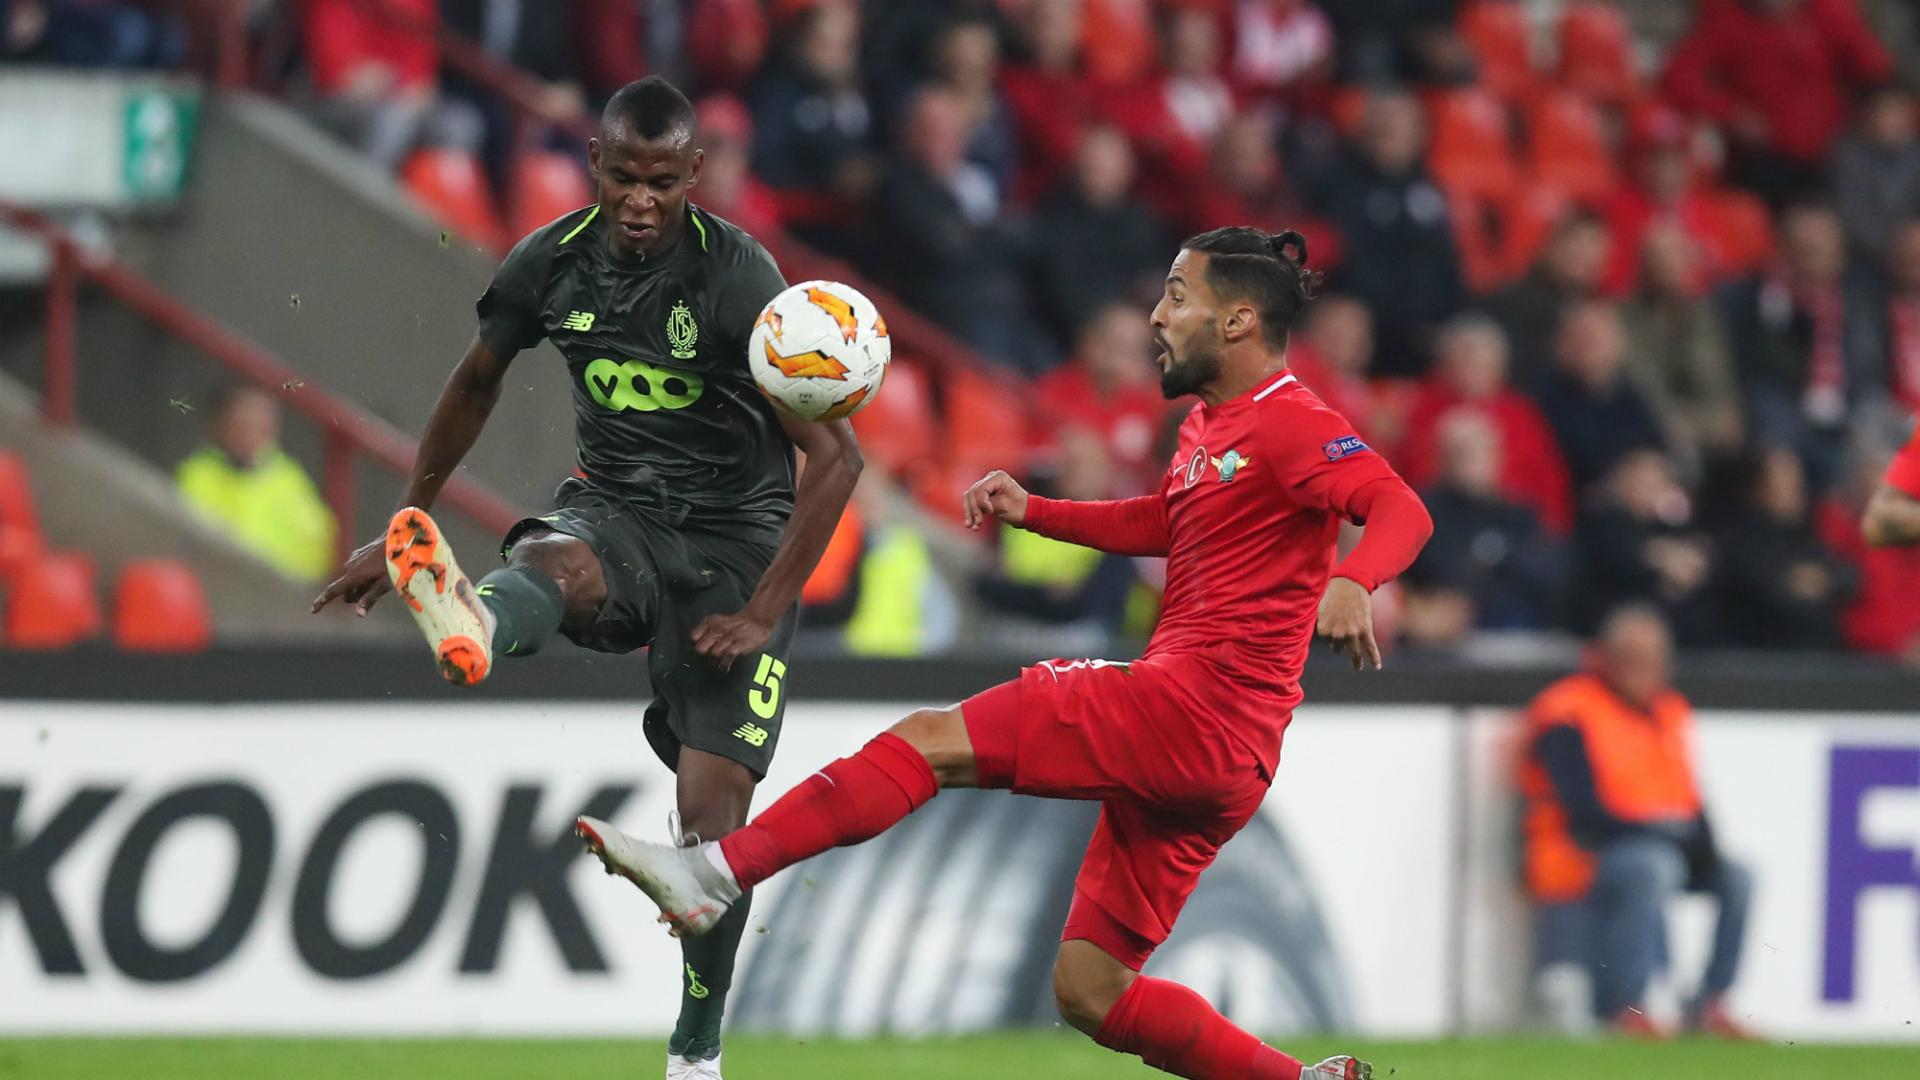 Agbo: Deportivo La Coruna sign Nigeria midfielder on loan